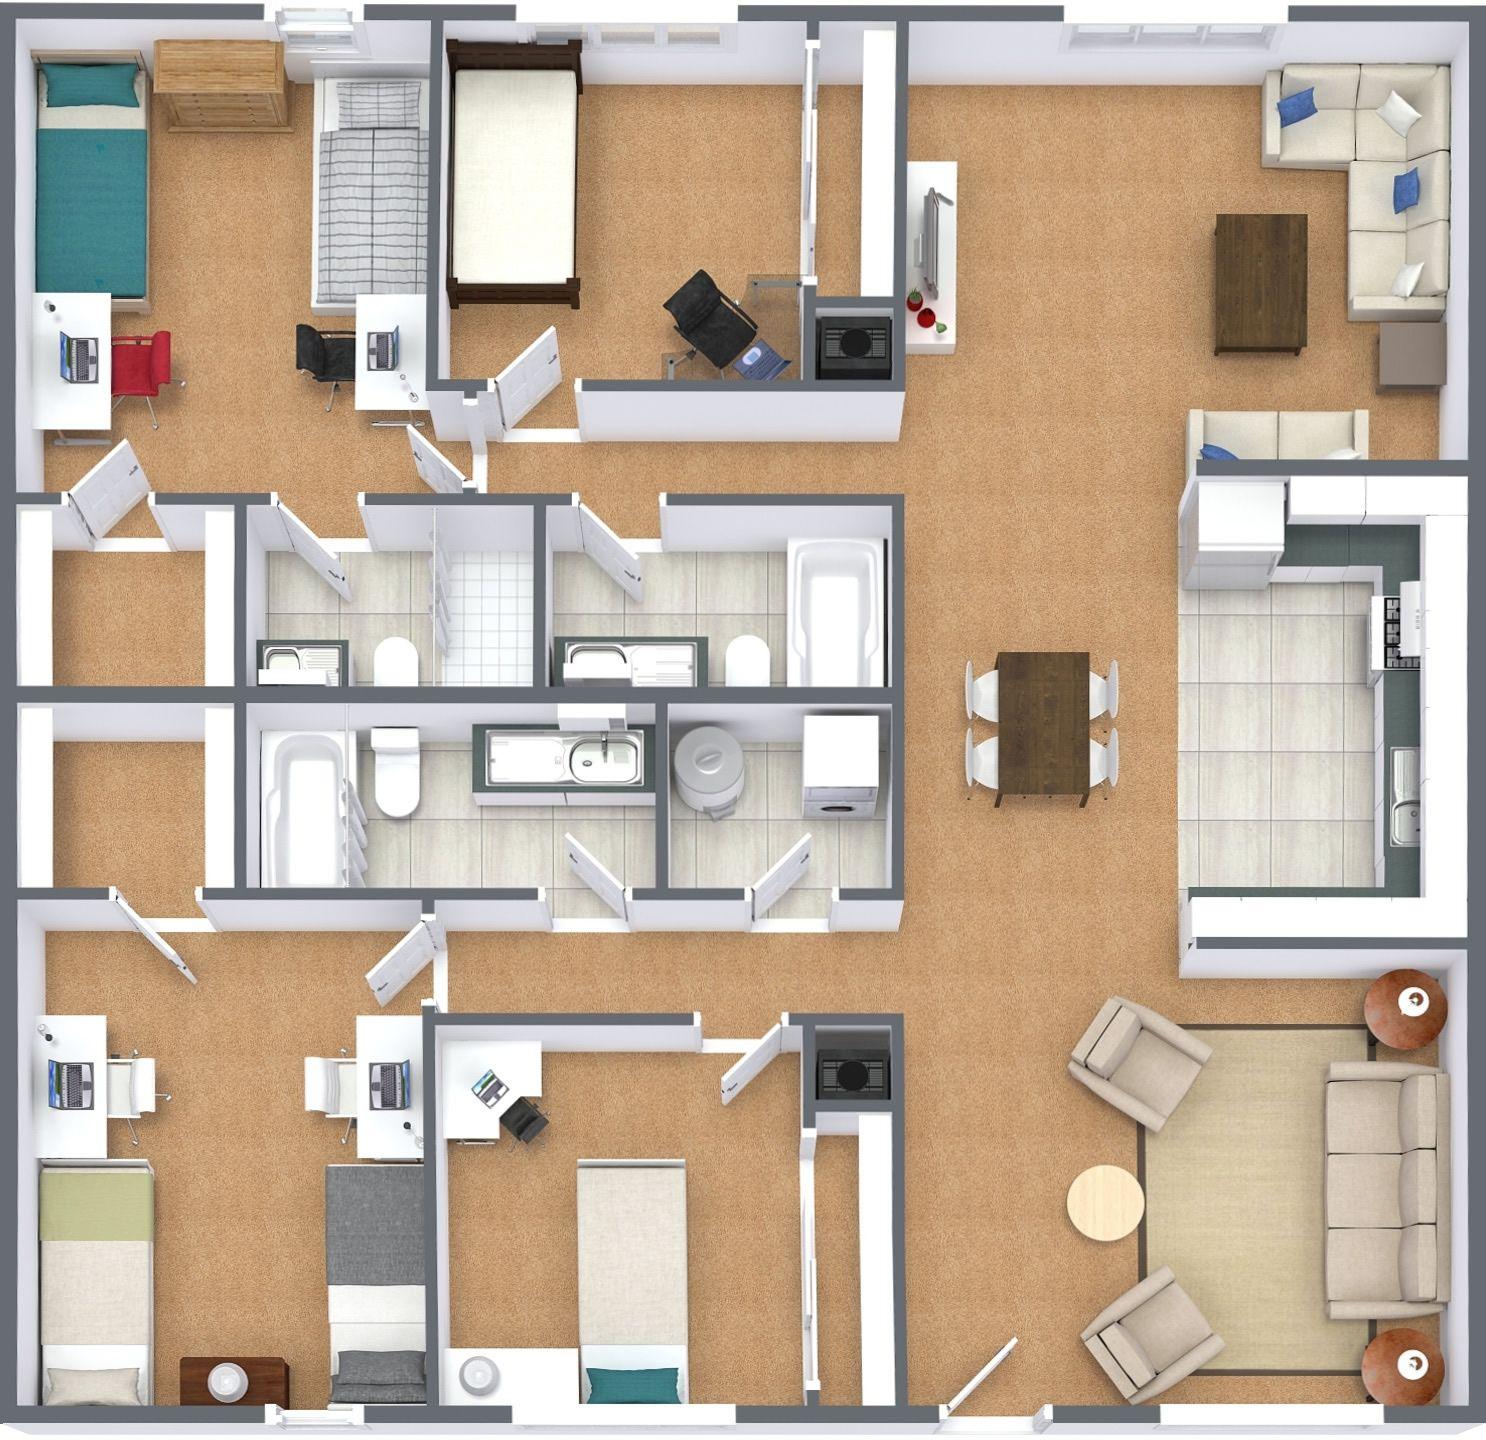 Floor Plans Sycamore Lane Apartments Floor plans